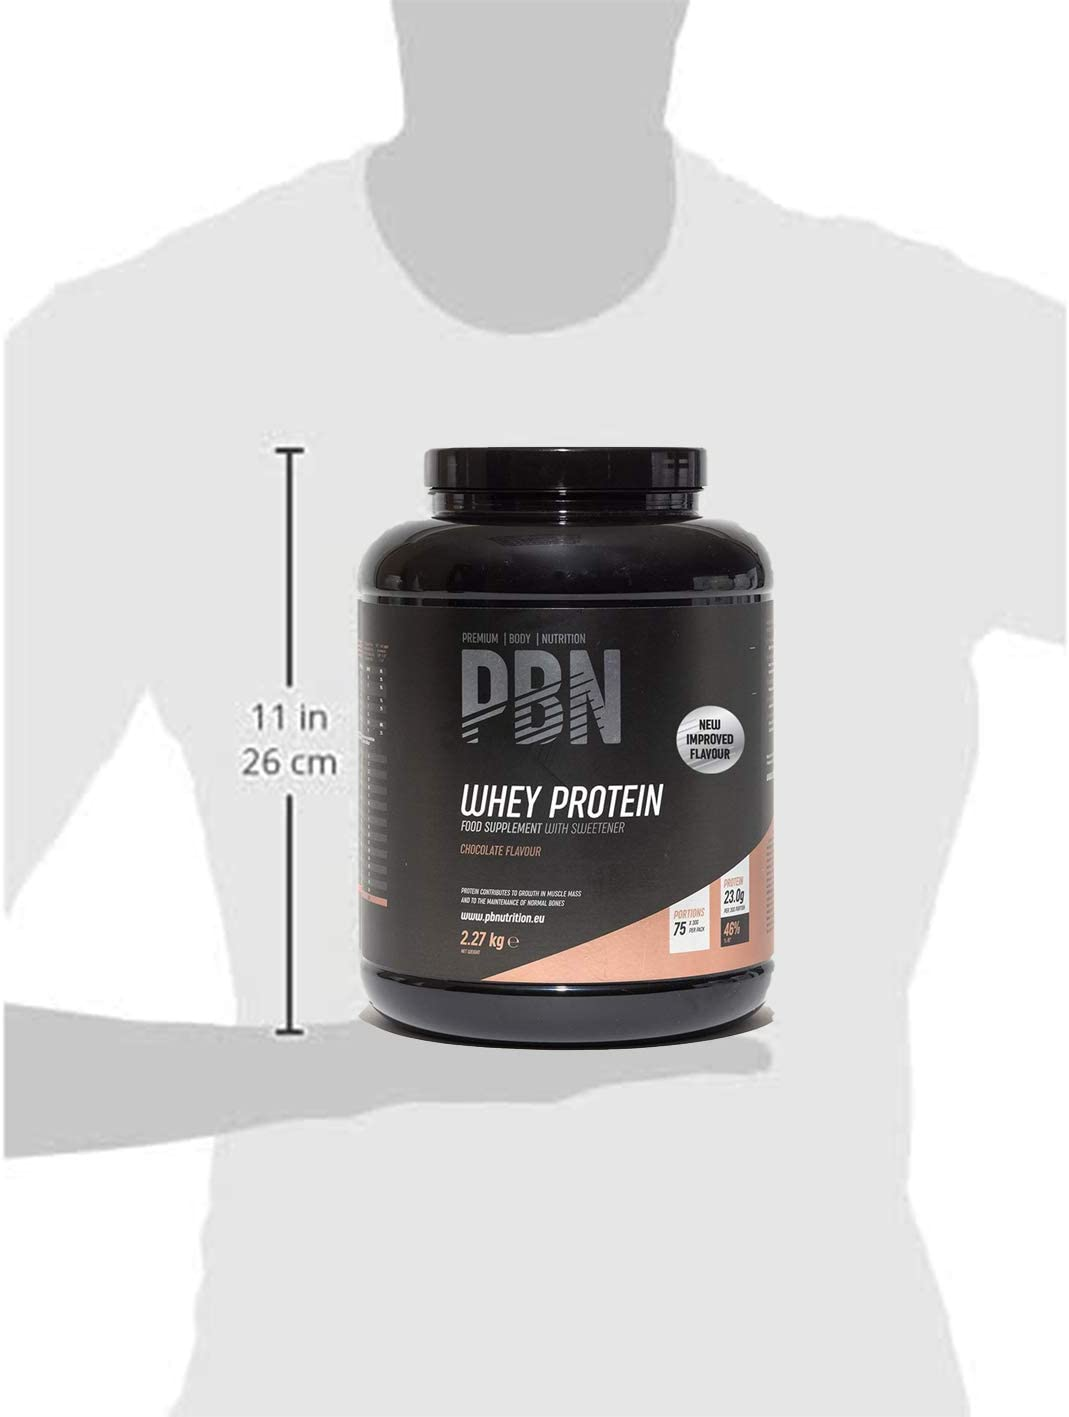 PBN Premium Body Nutrition - Proteína de suero de leche en polvo, 2.27 kg (Paquete de 1), sabor Chocolate, sabor optimizado